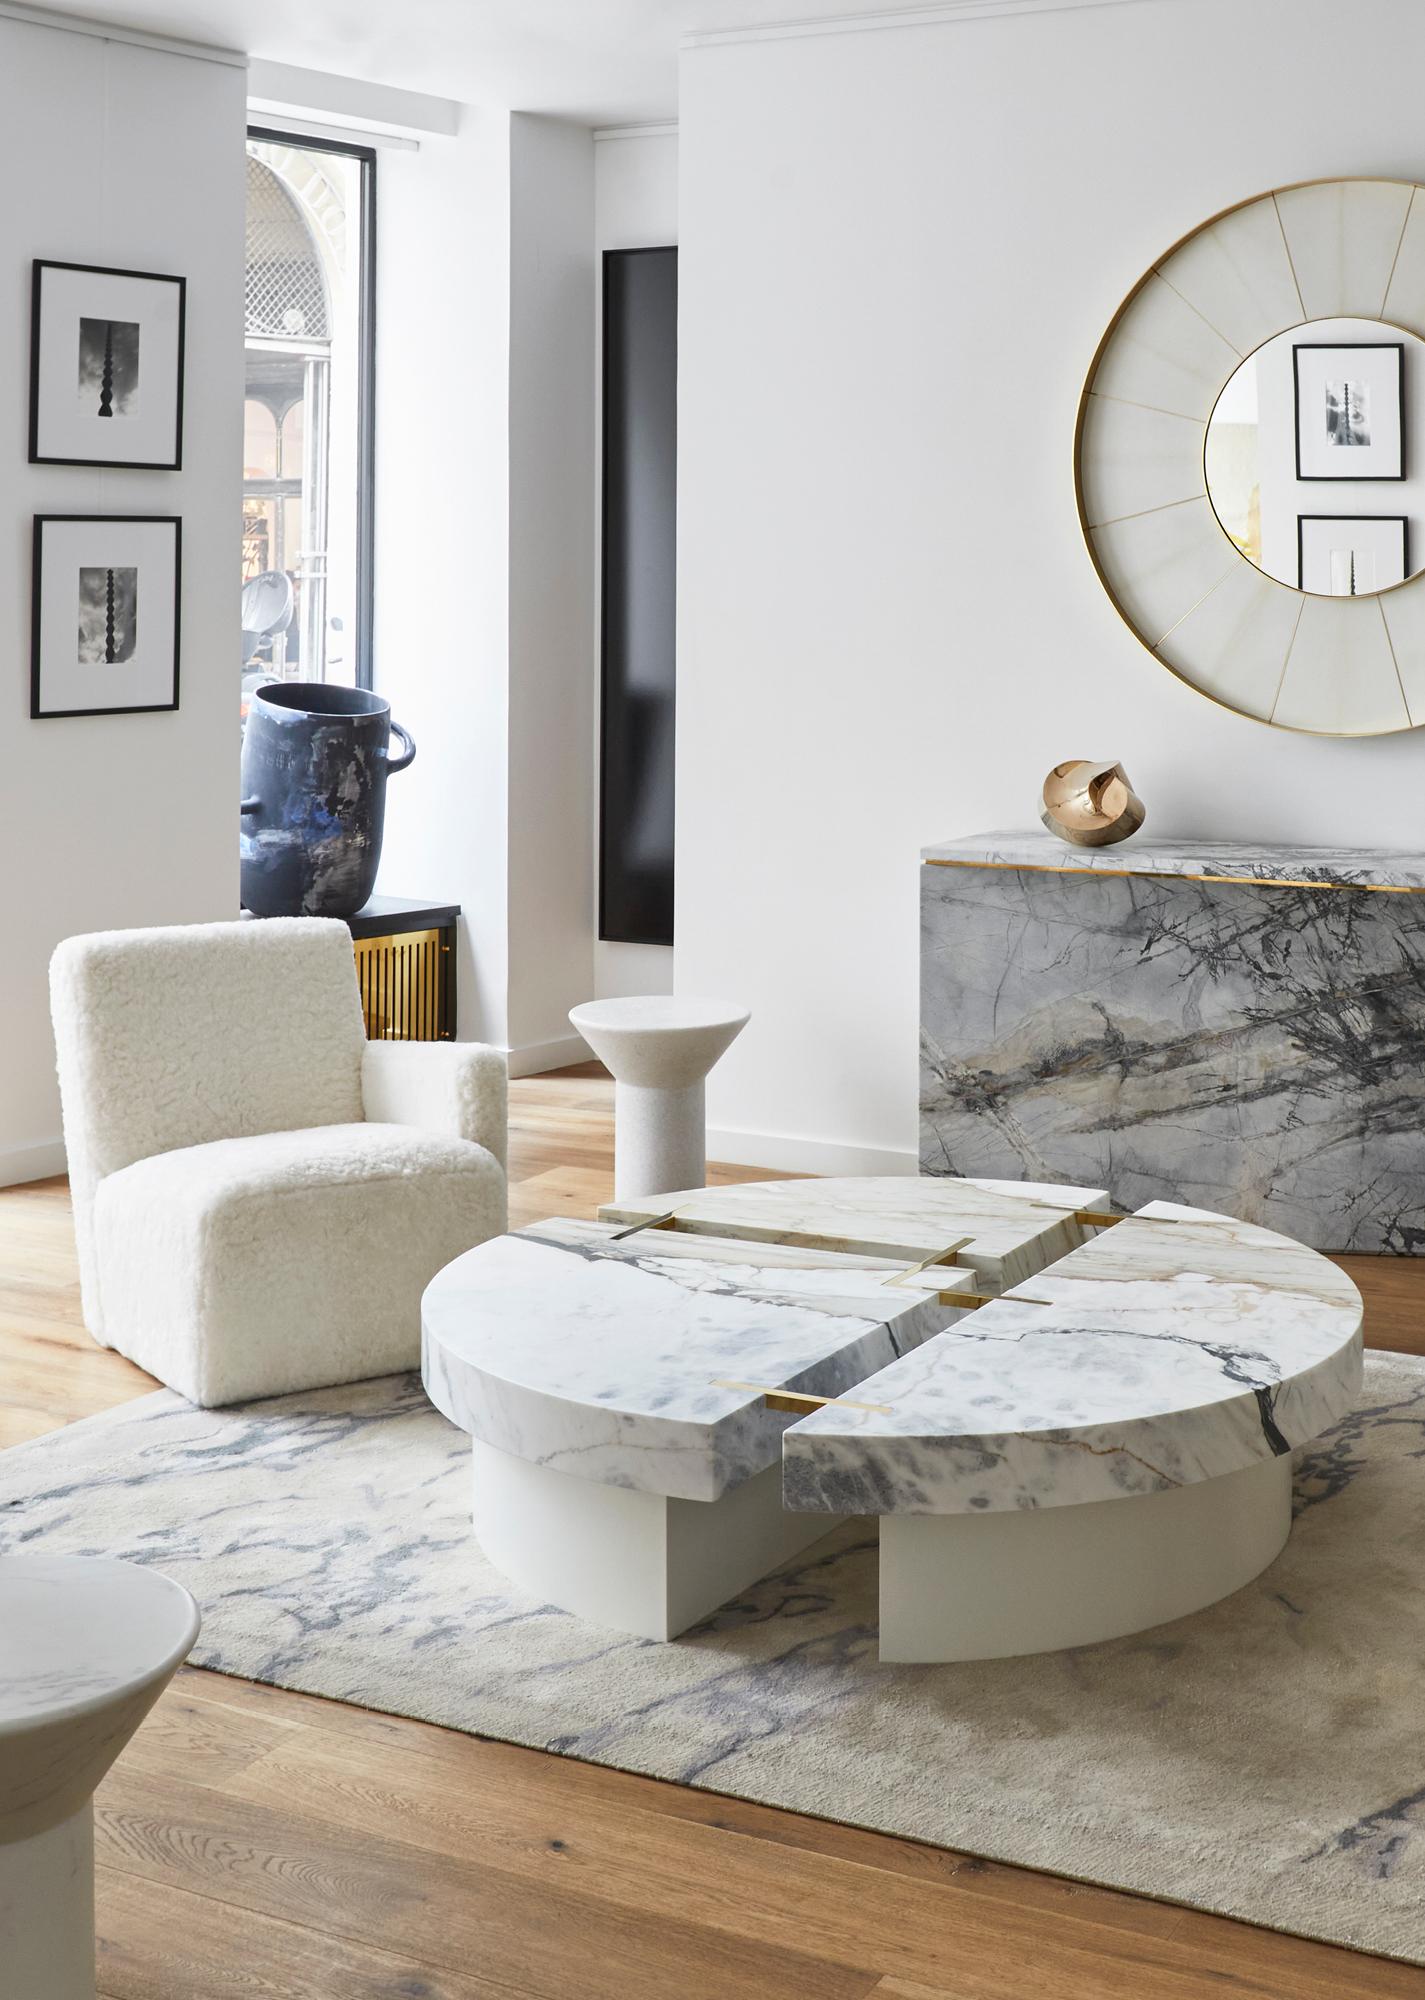 À propos - Galerie Negropontes